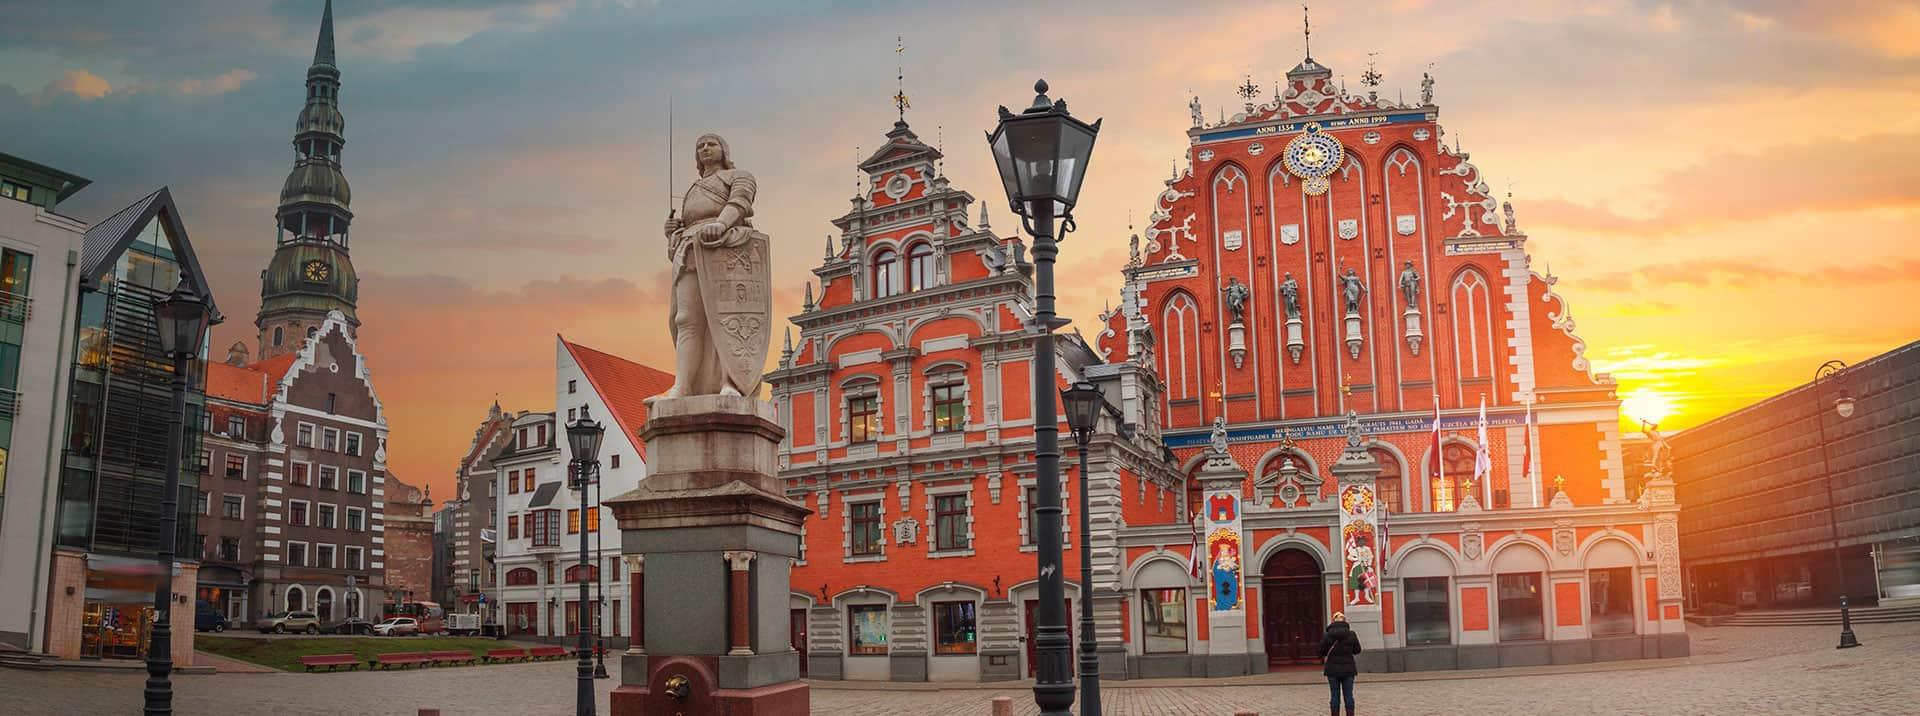 Featured-Imagee_Latvia_1920x716